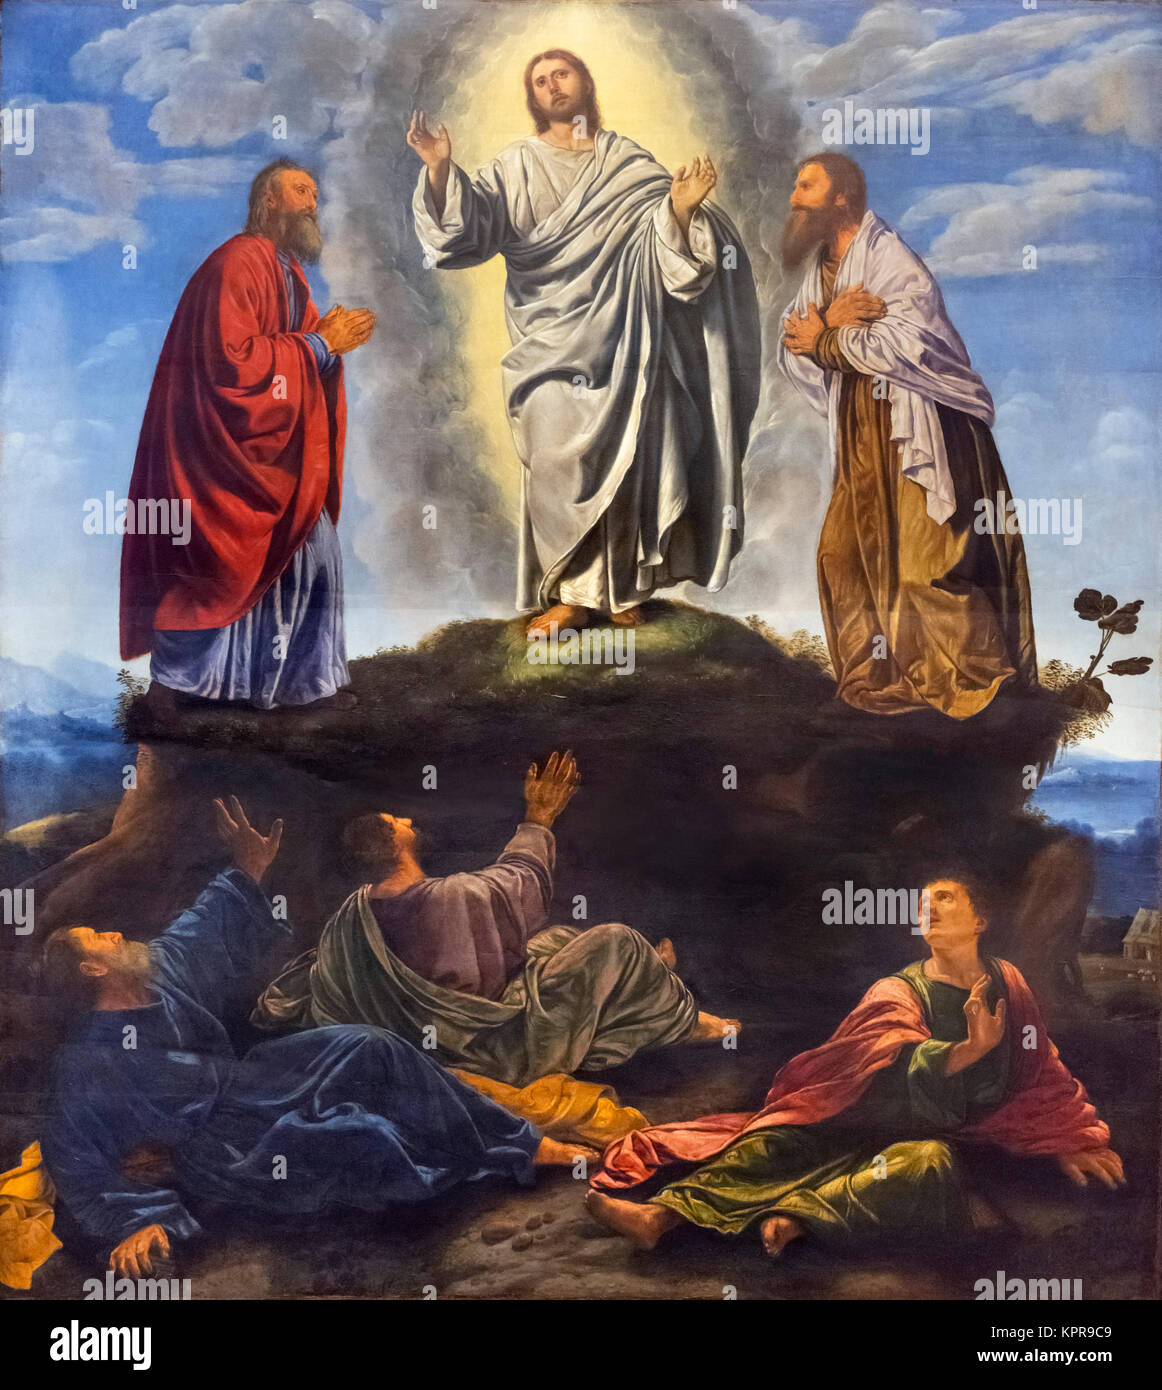 The Transfiguration by Giovanni Girolamo Savoldo (c.1480 - c.1548), oil on panel, c.1530-35. The painting shows - Stock Image